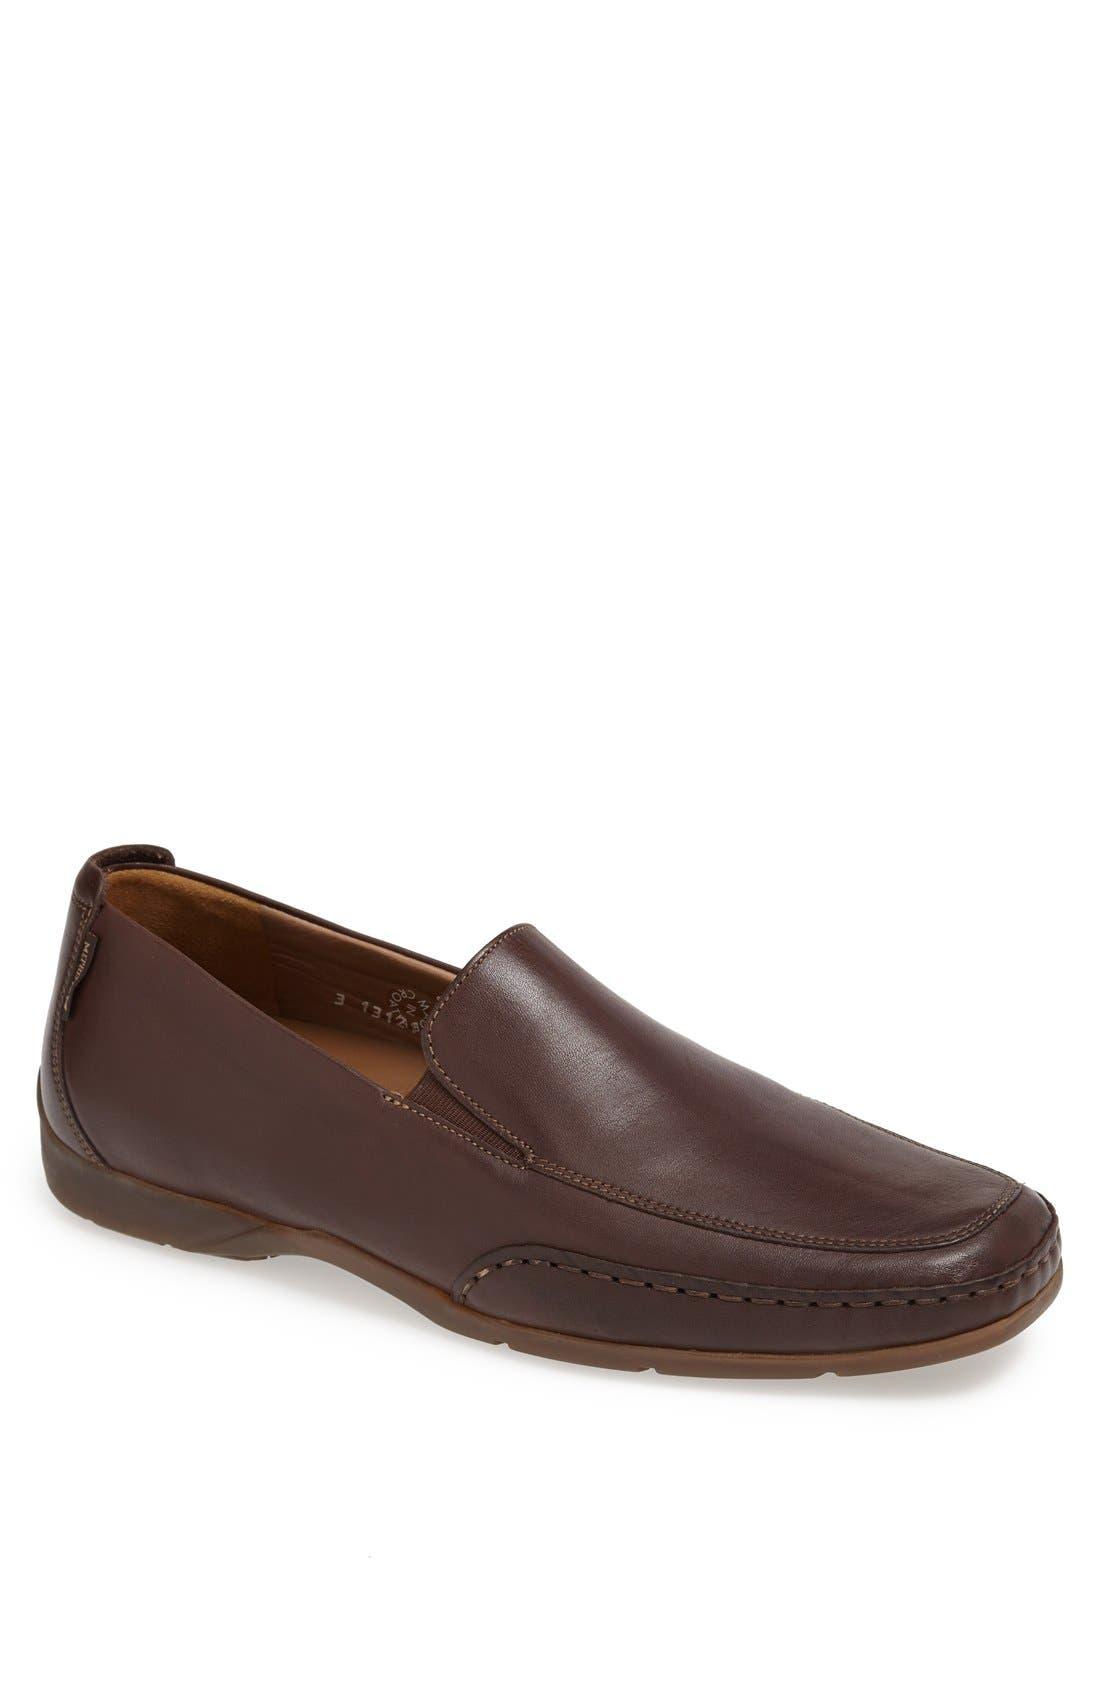 Men's Mephisto Shoes | Nordstrom